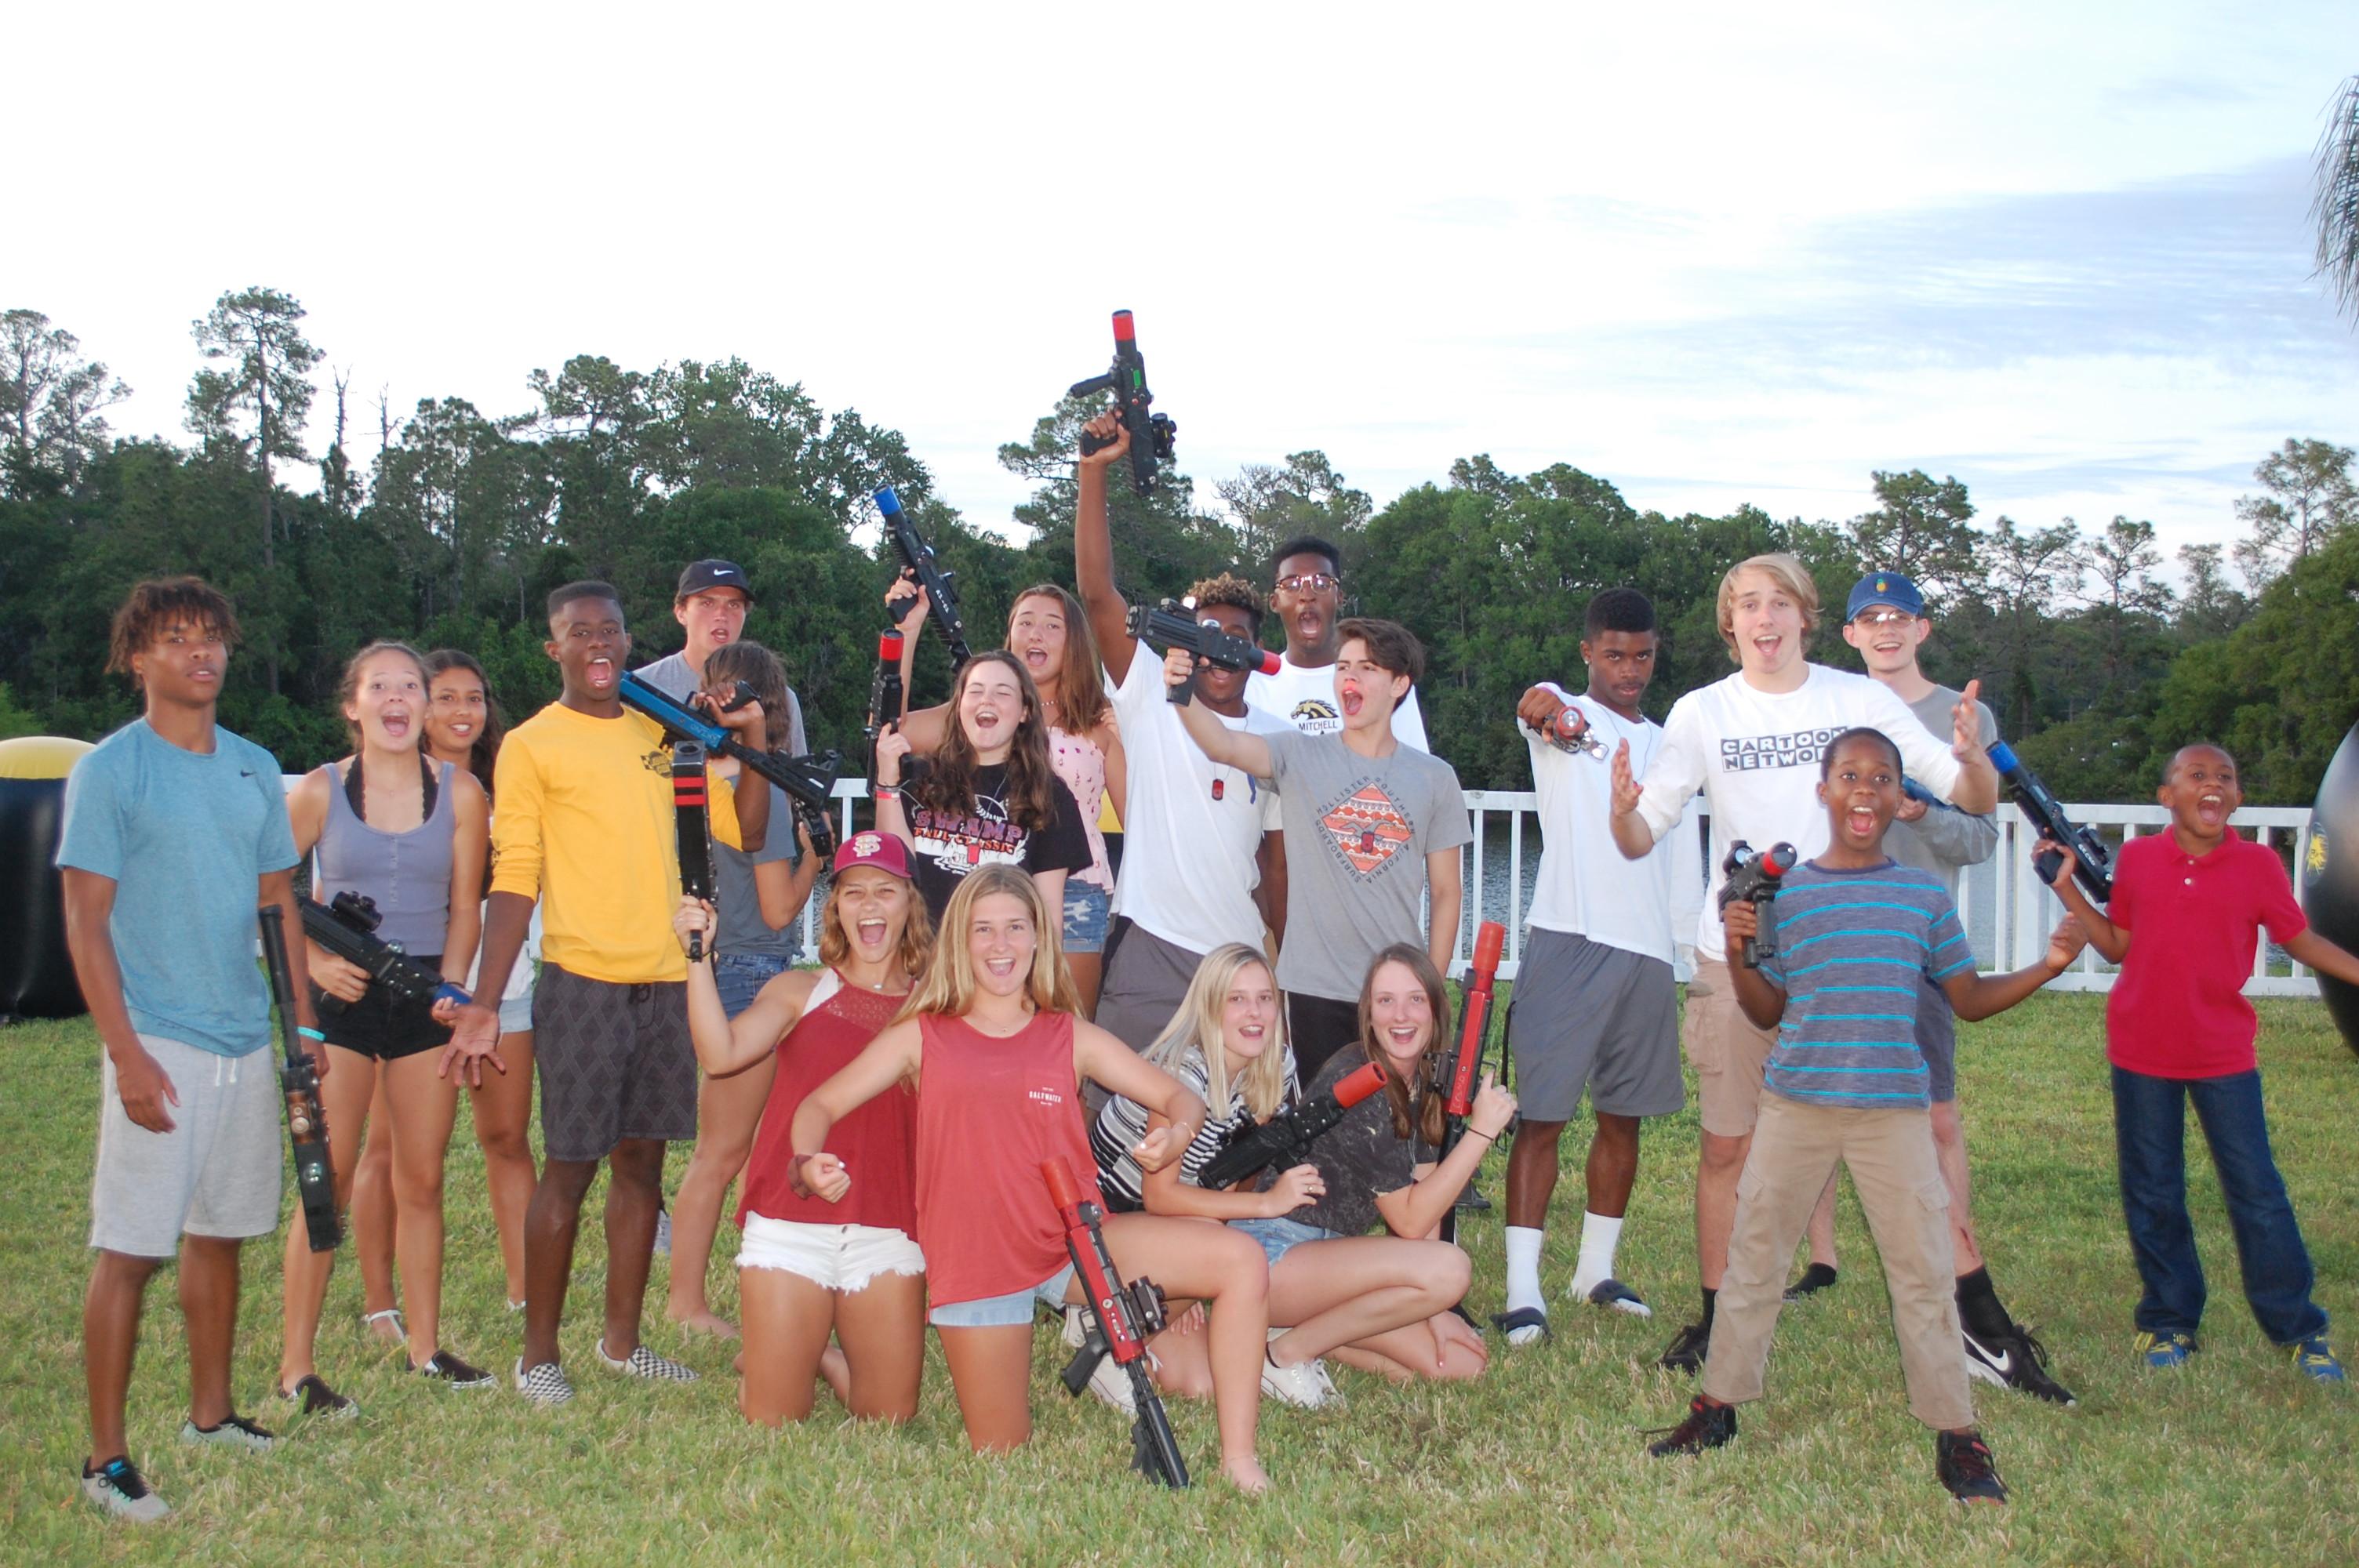 Teenage birthday party ideas in FL